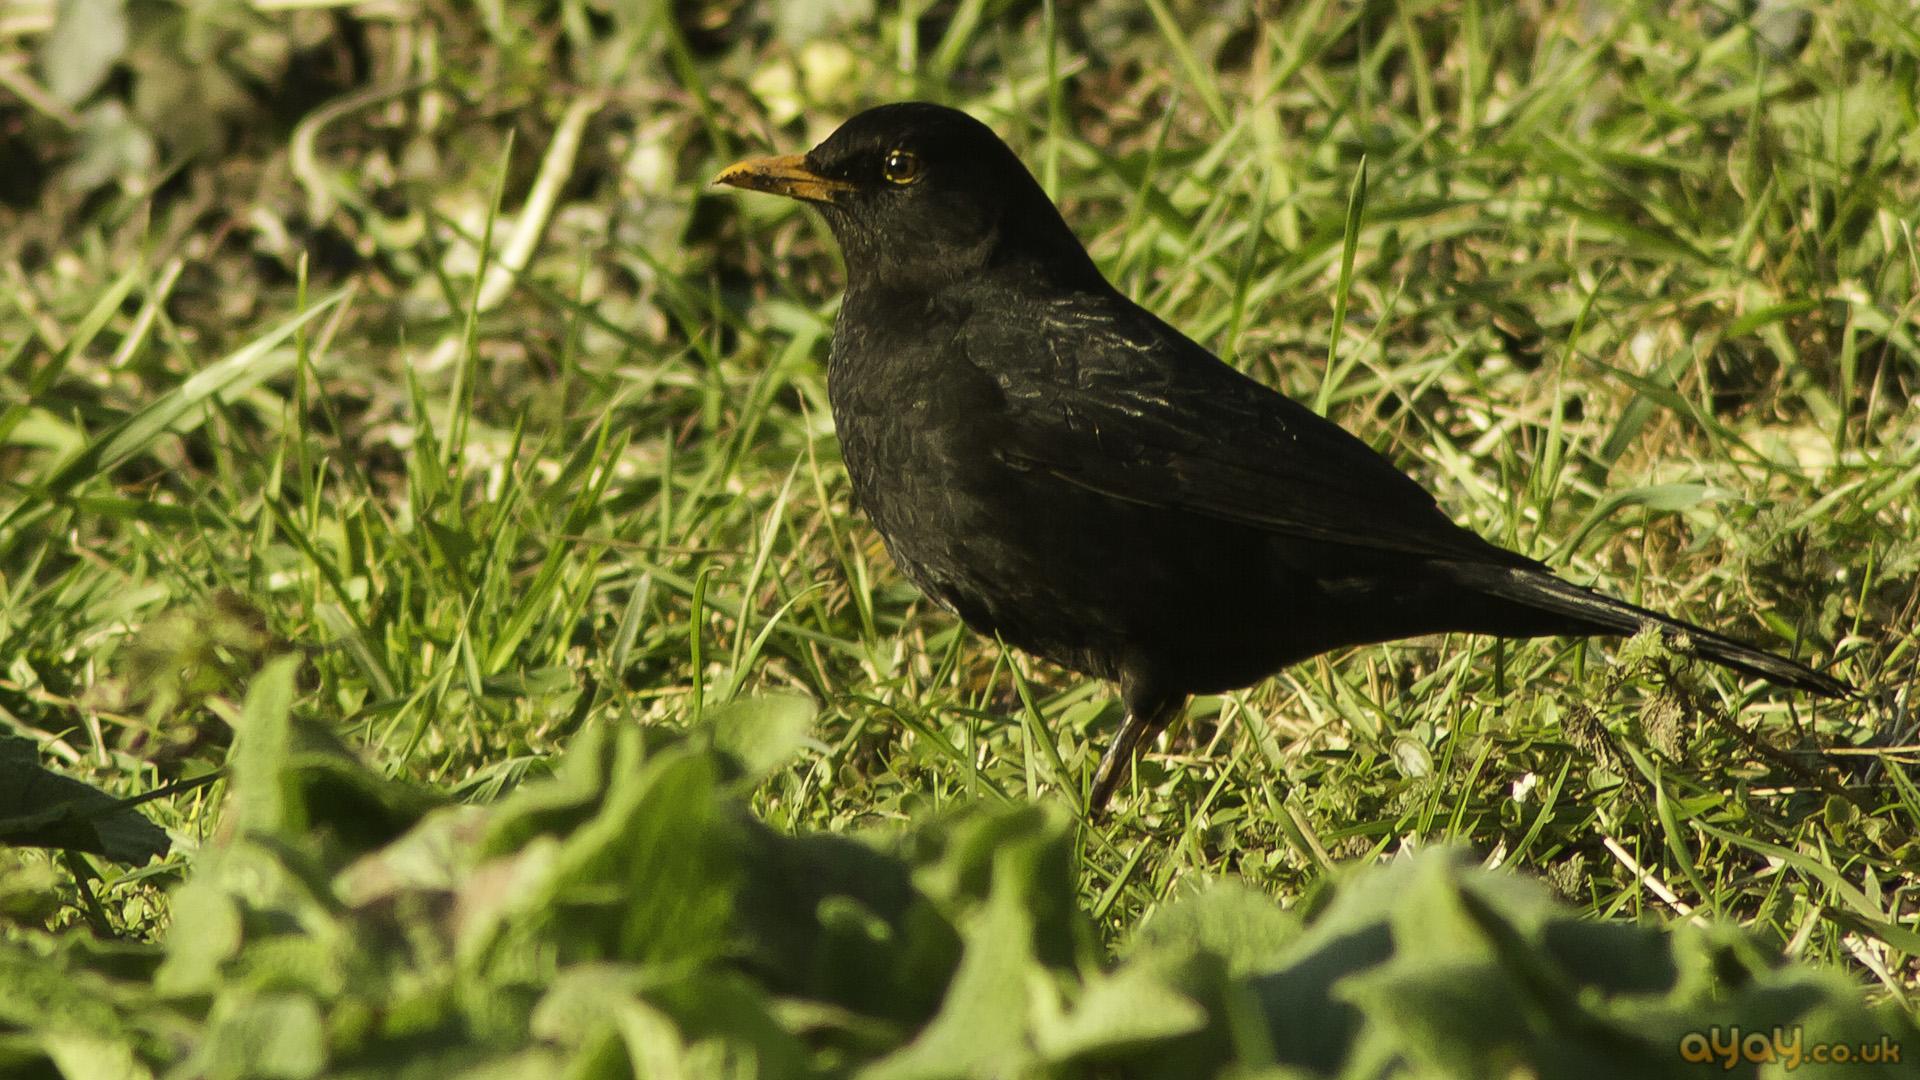 blackbird hopping on ঘাস